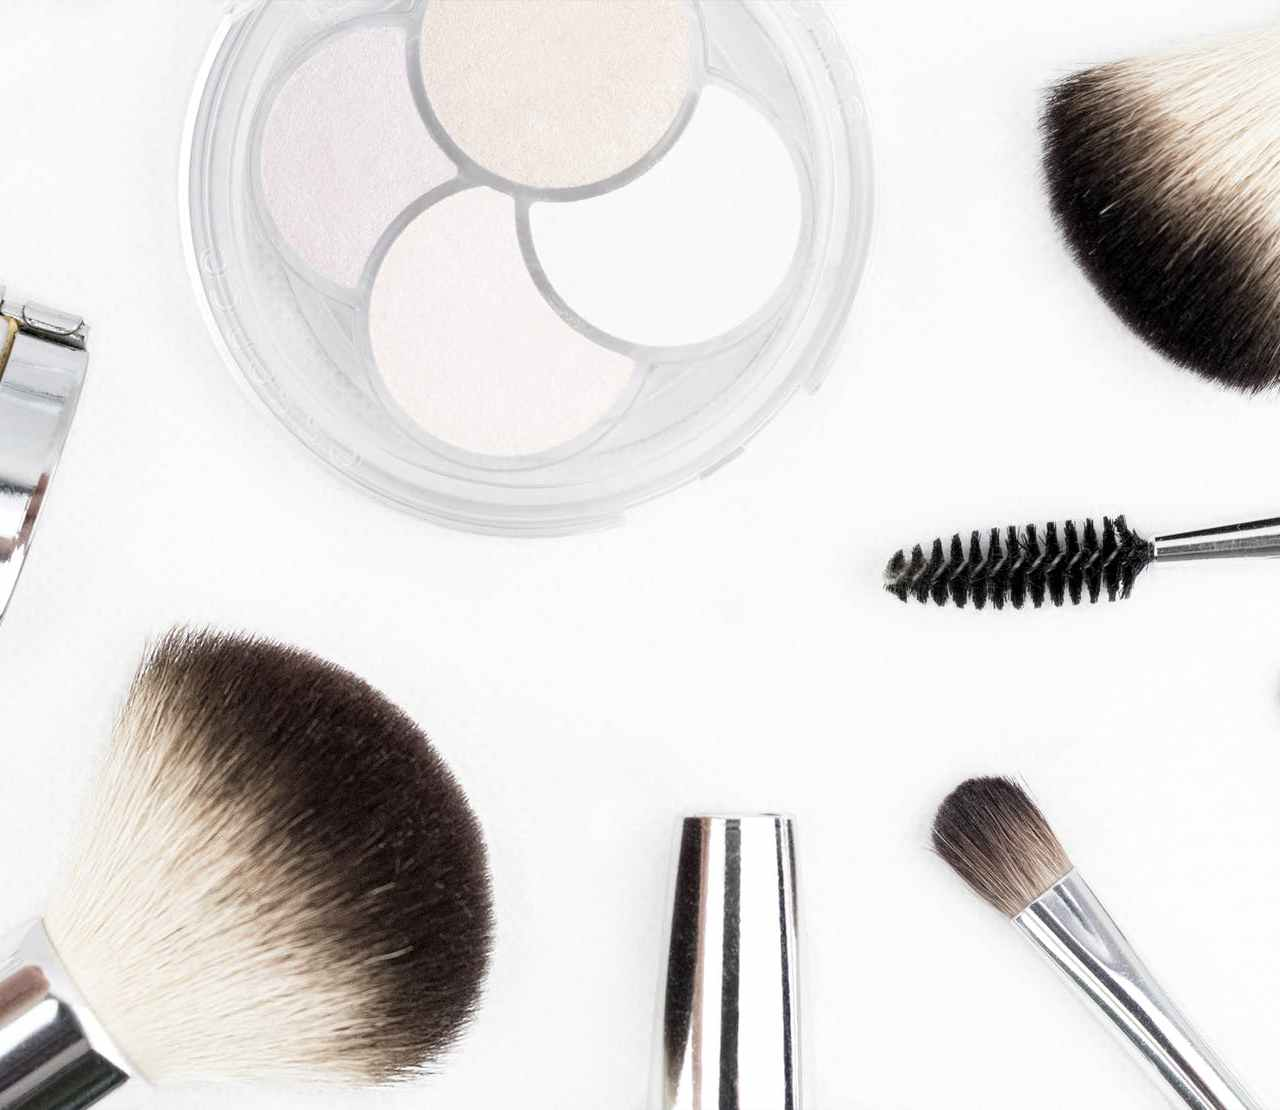 Ulta 21 Days of Beauty Picks – Fall 2018